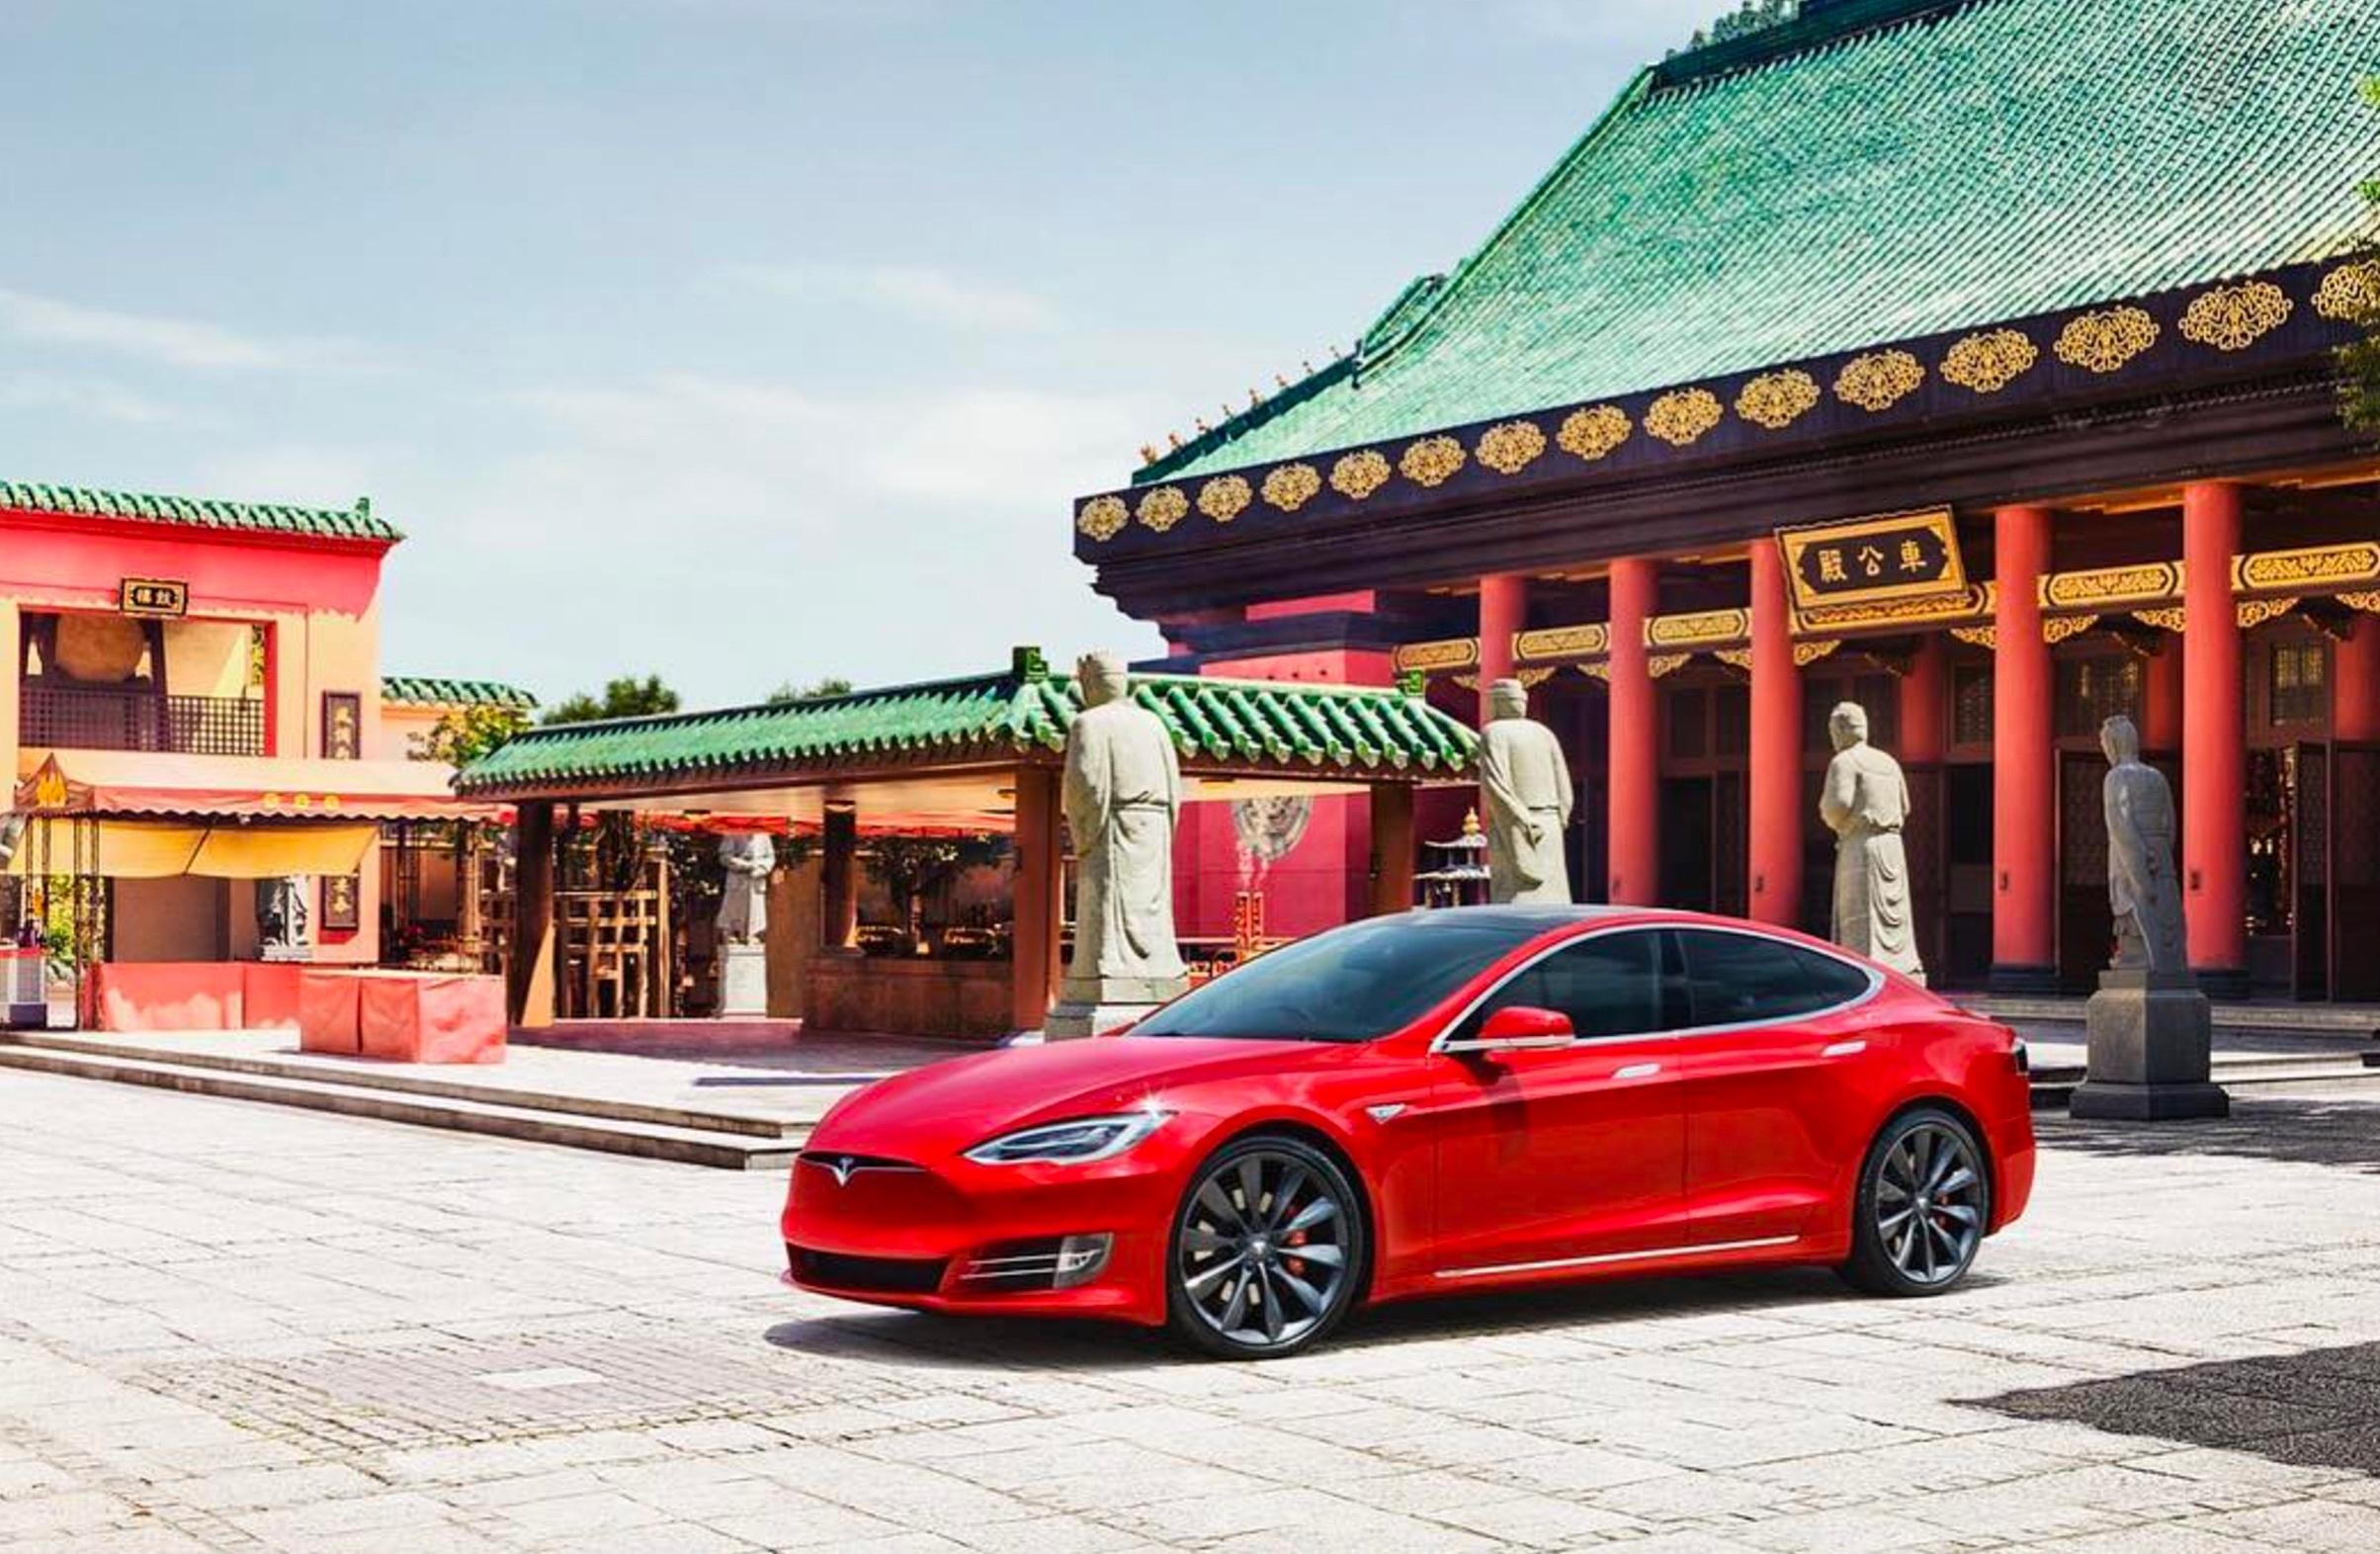 Imagen promocional de un Tesla Model S en China